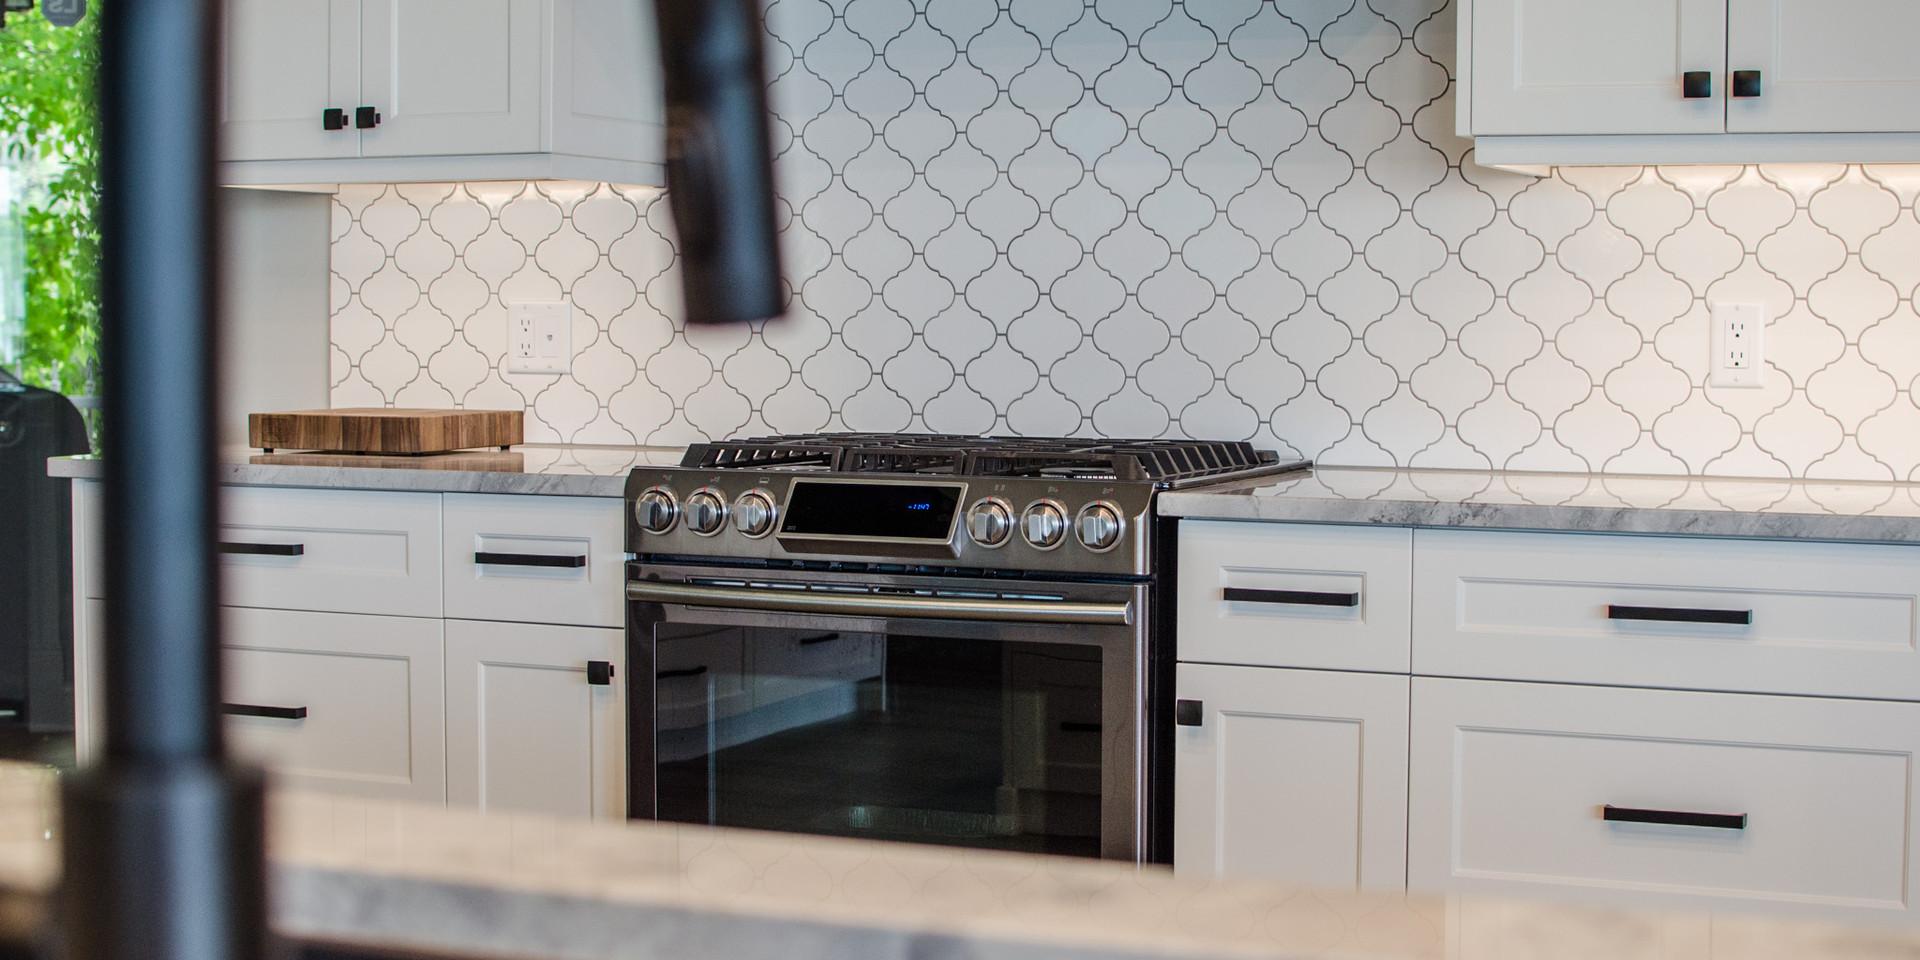 Tiled Kitchen & Bar